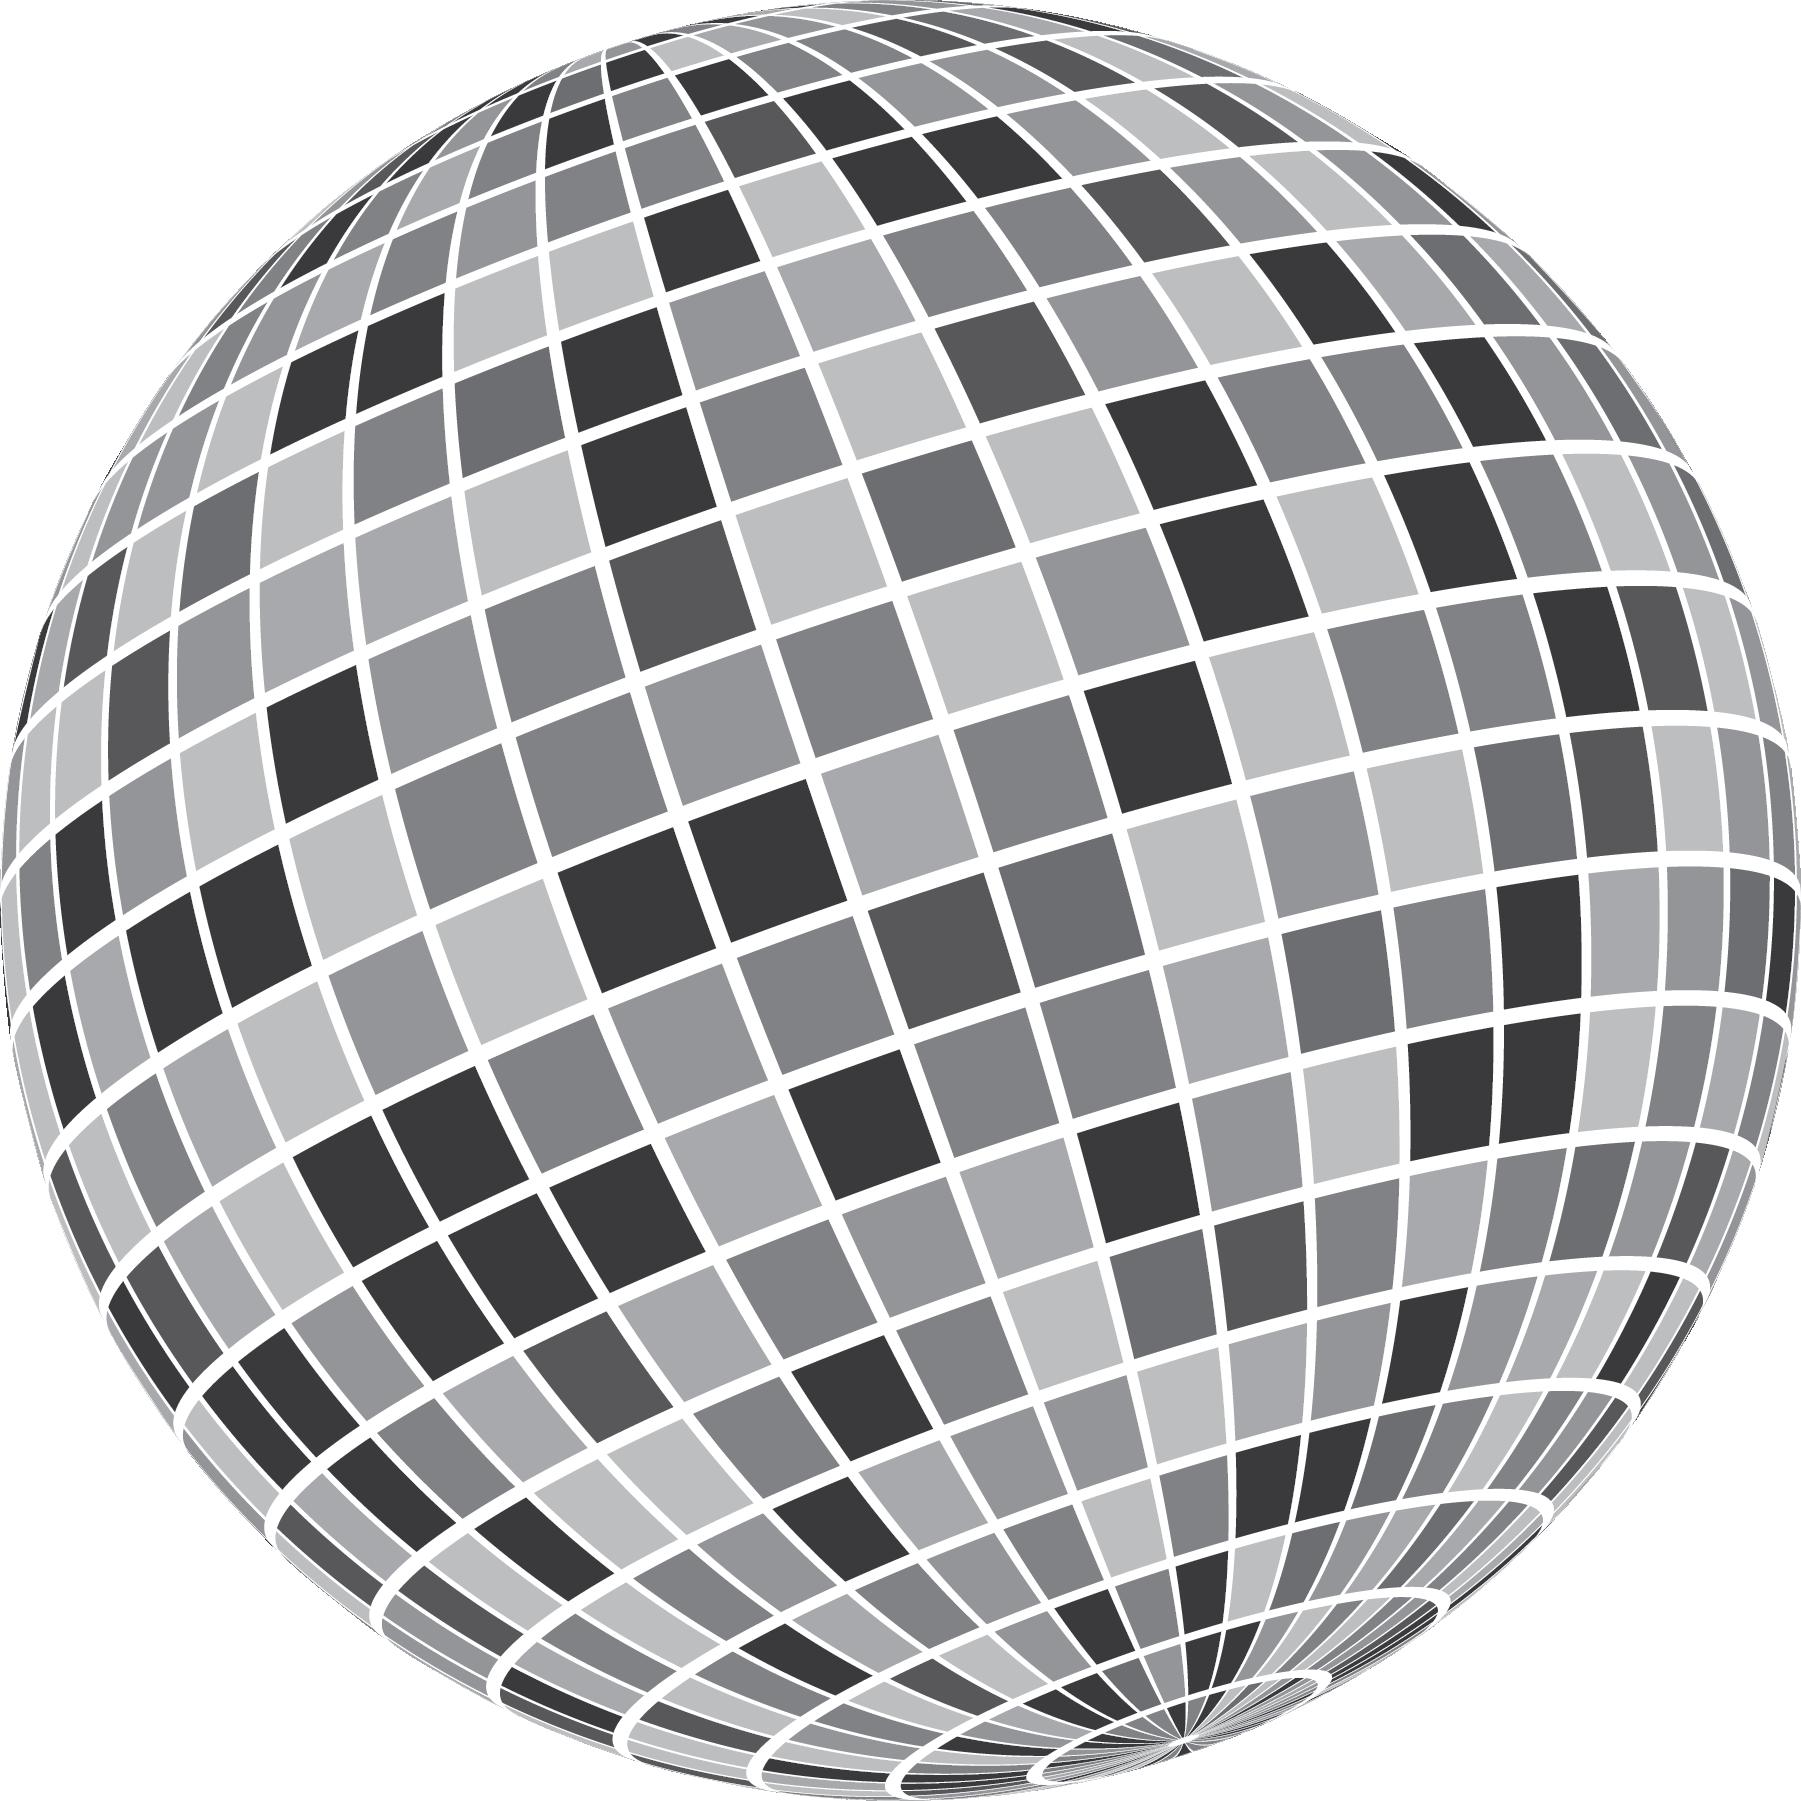 1801x1801 15 Disco Vector Illustrator For Free Download On Mbtskoudsalg